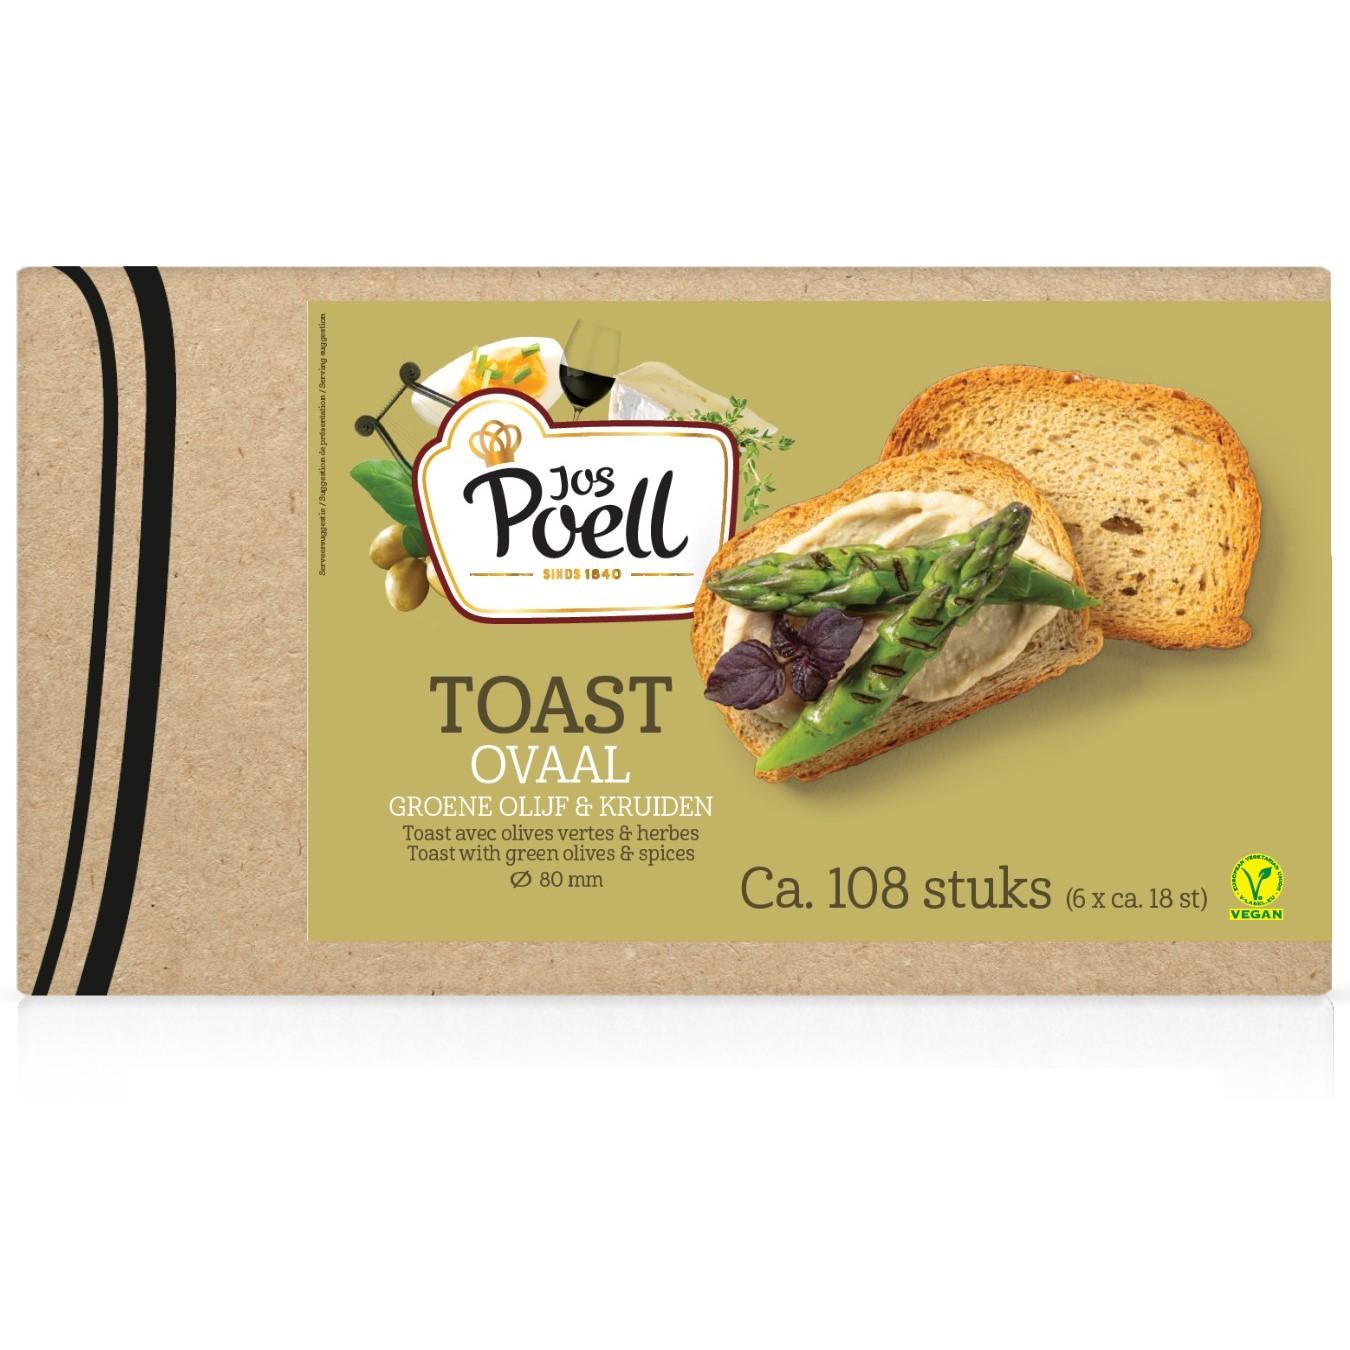 Toast – Horeca Toast ovaal groene olijf & kruiden 108 stuks